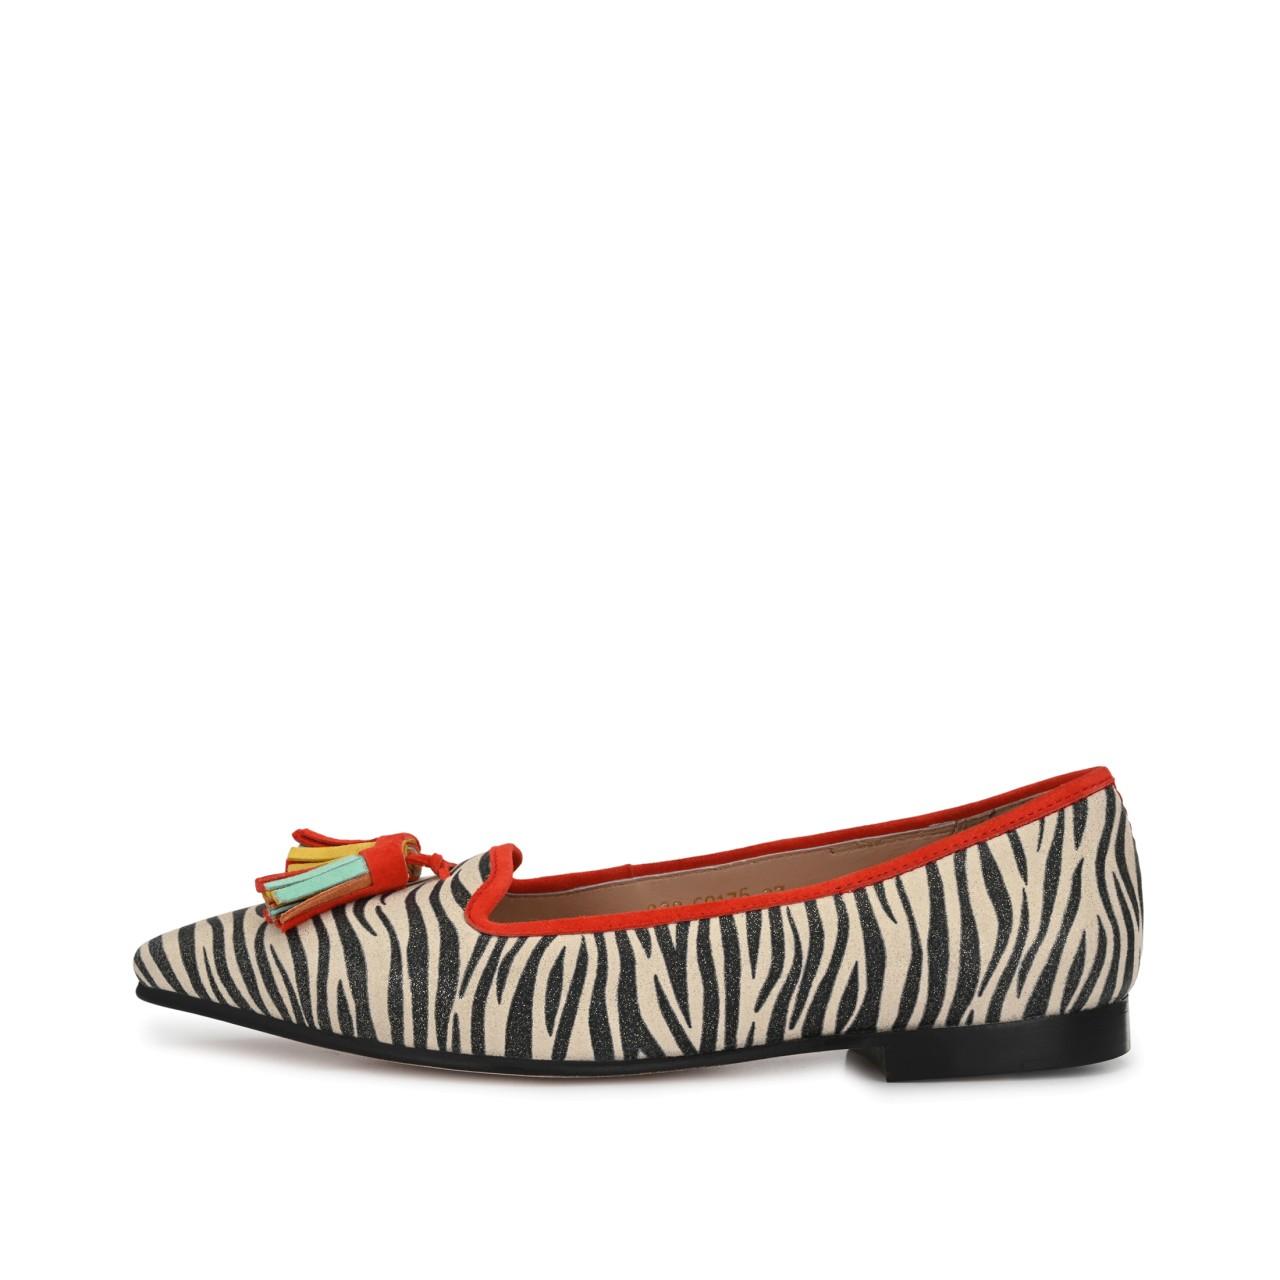 MARLA Rot mit Zebra